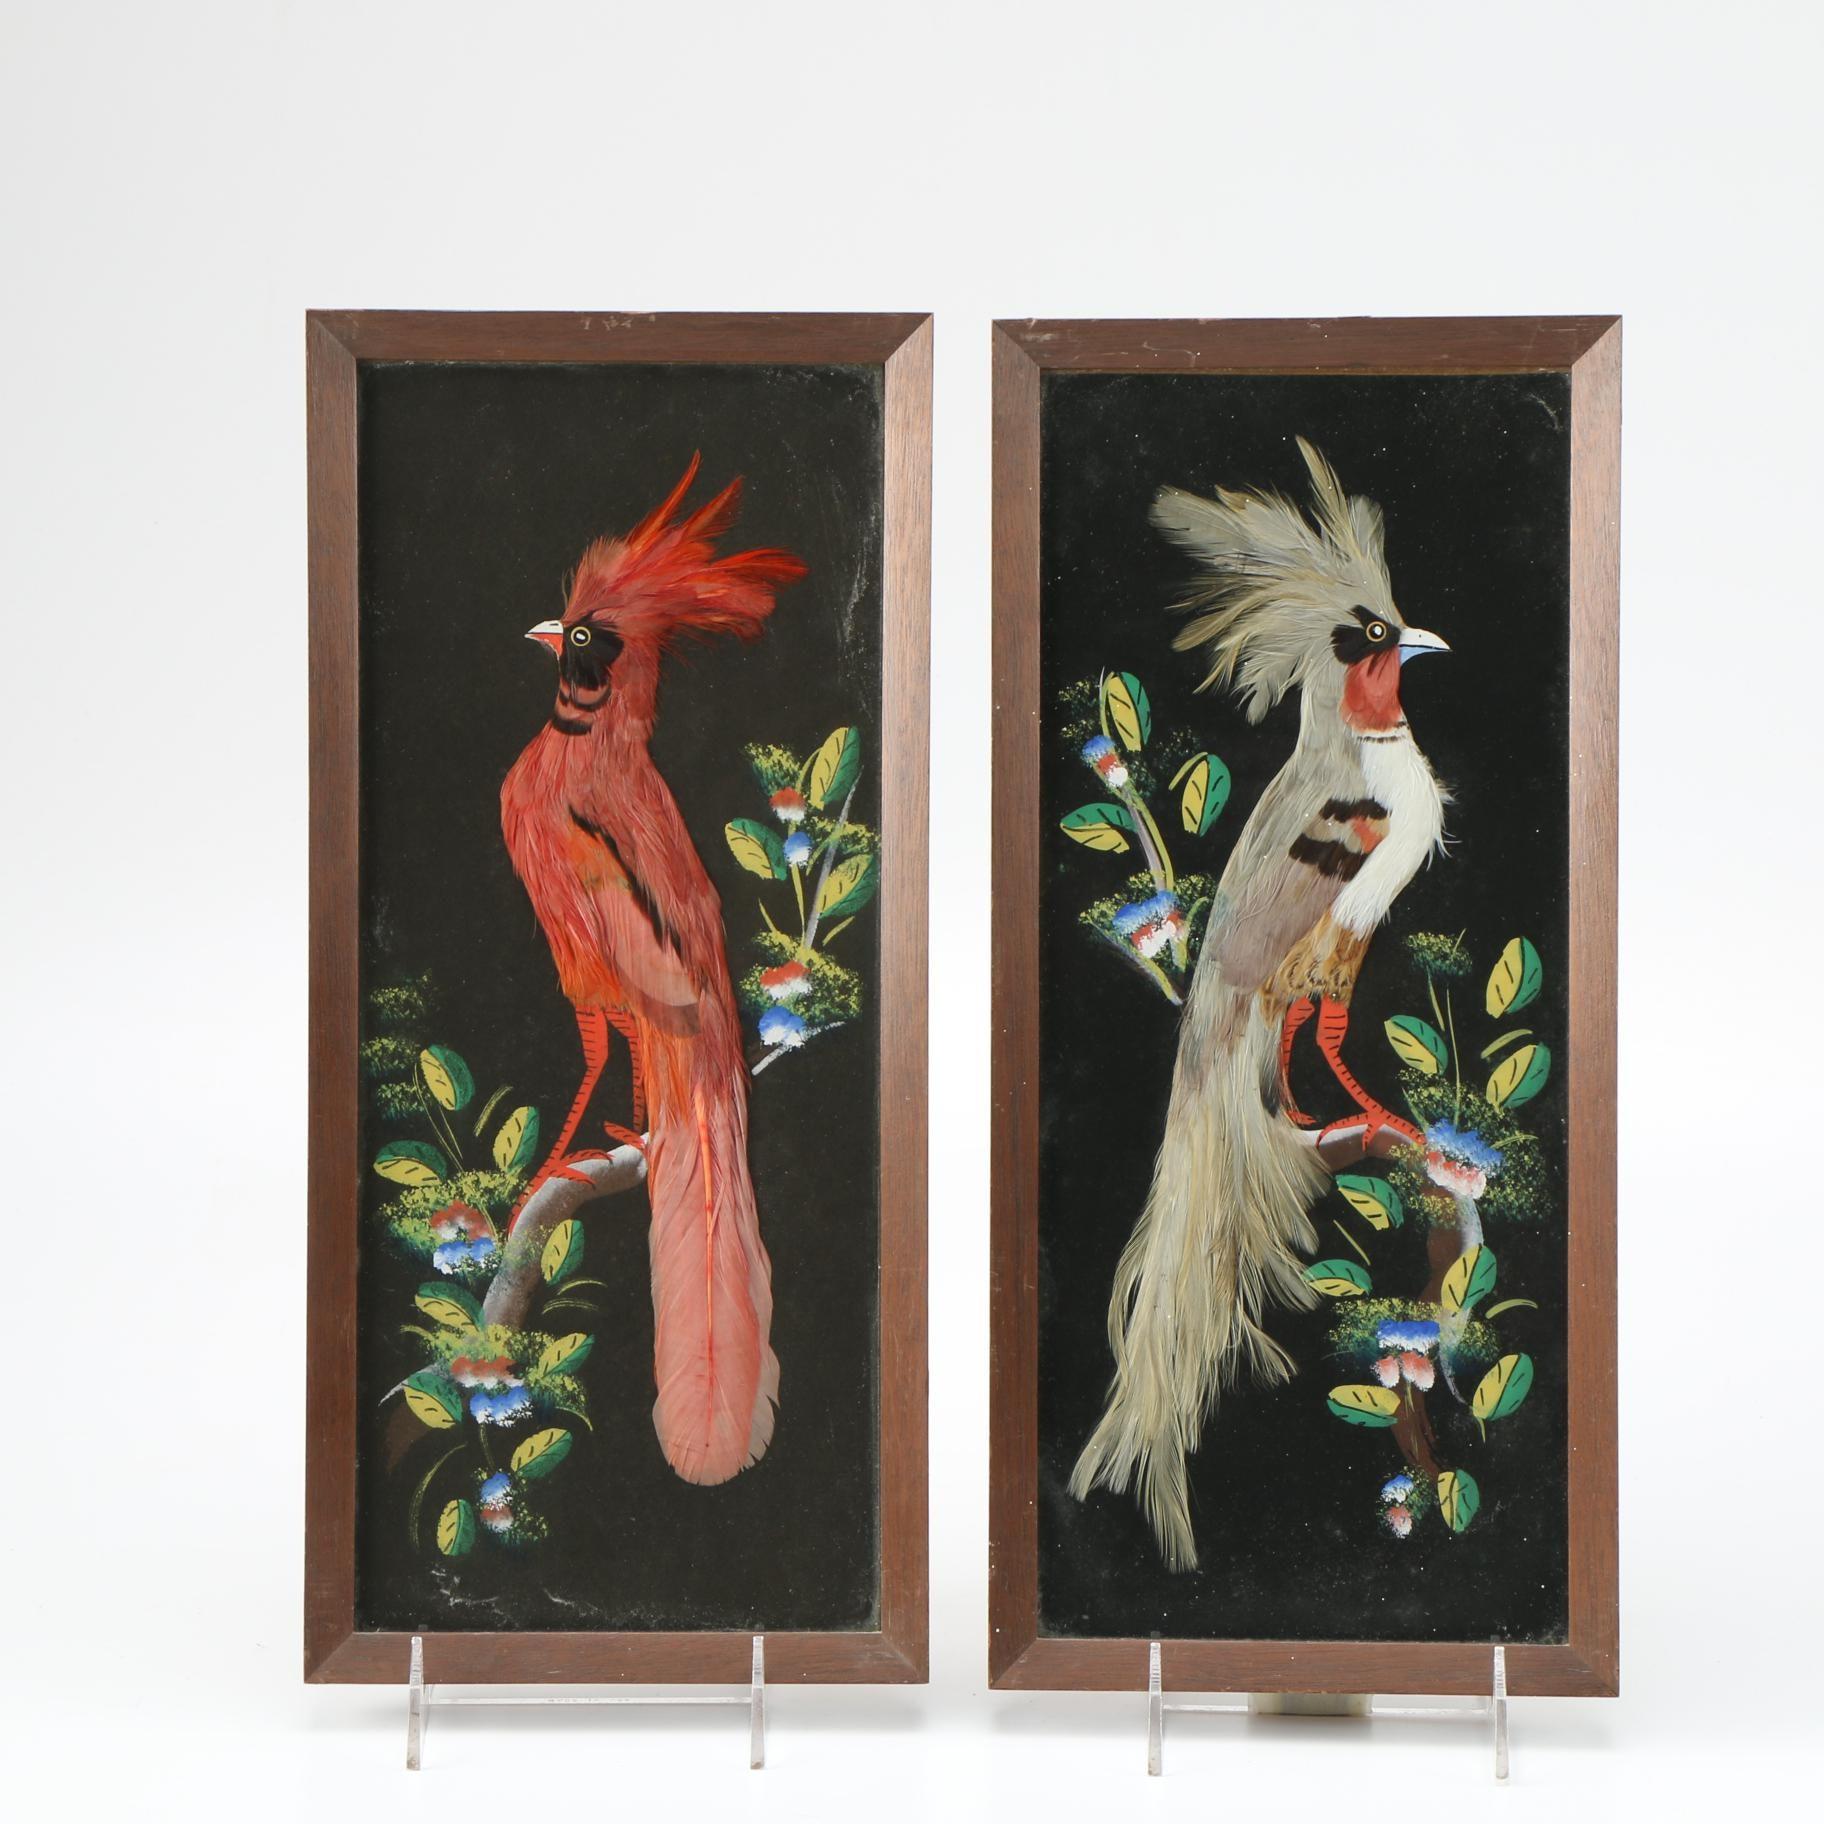 Framed Mixed Media Bird Portraits